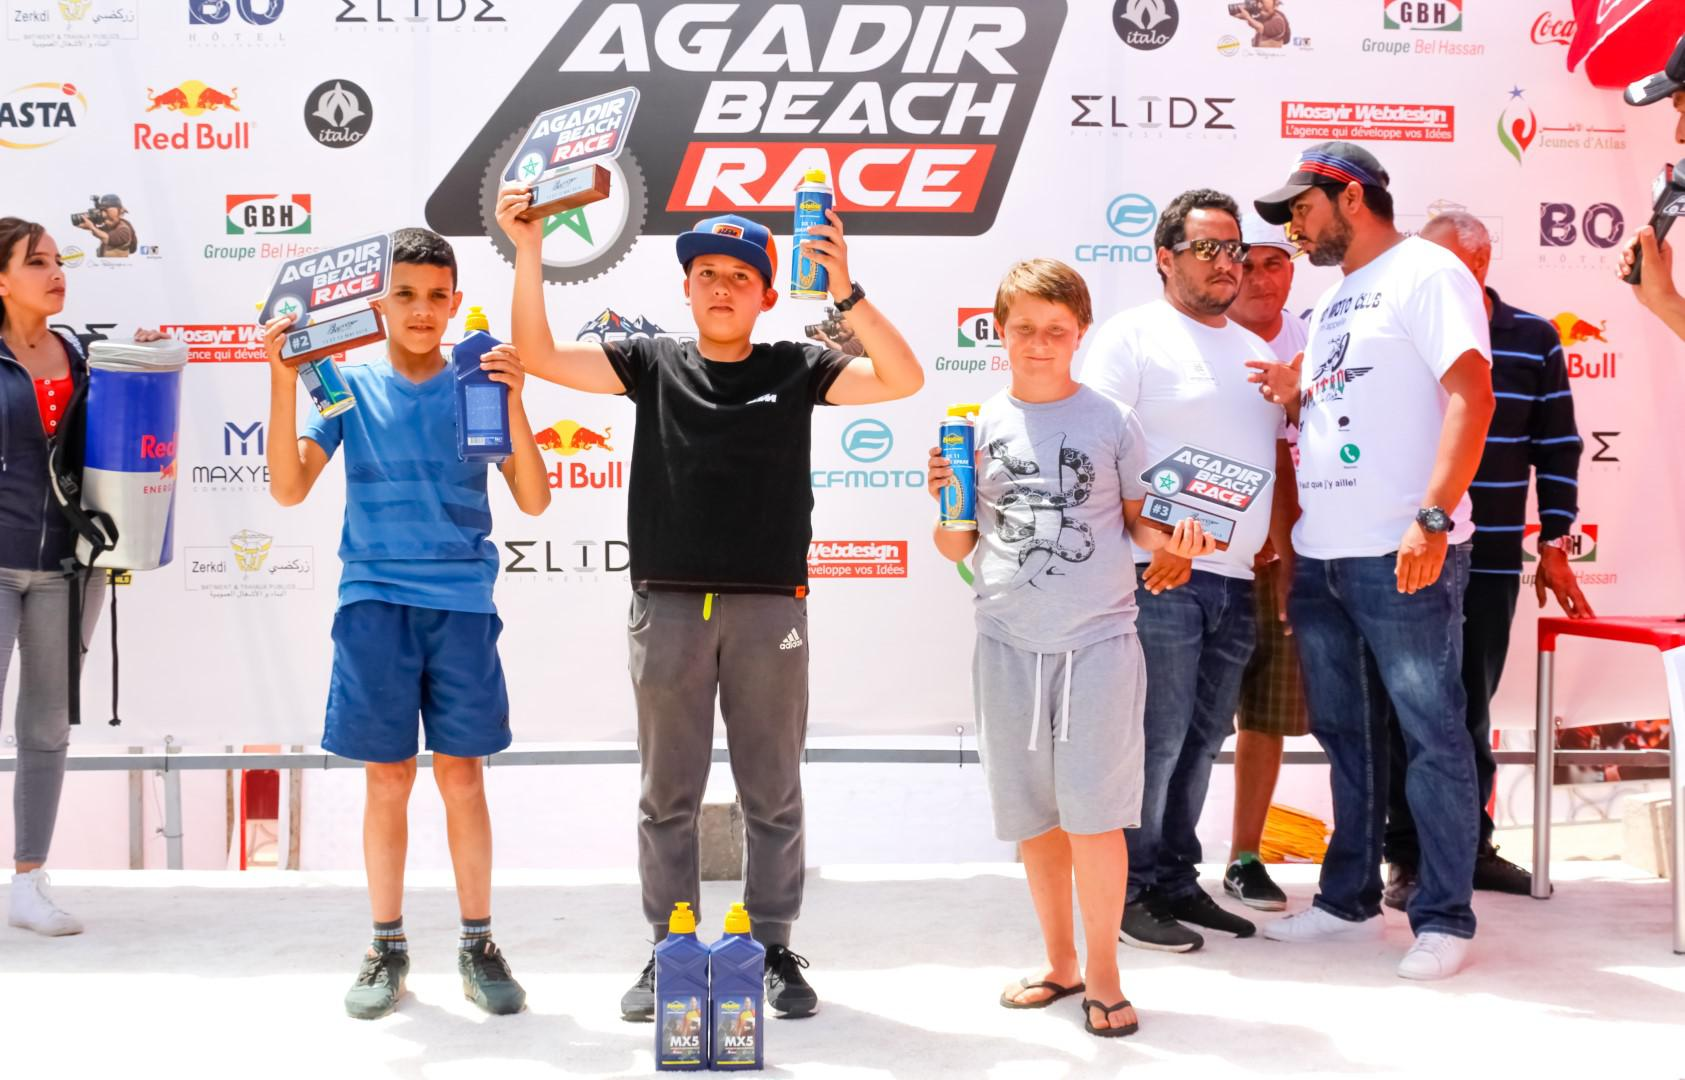 agadir-beach-race-la-reussite-791-14.jpg